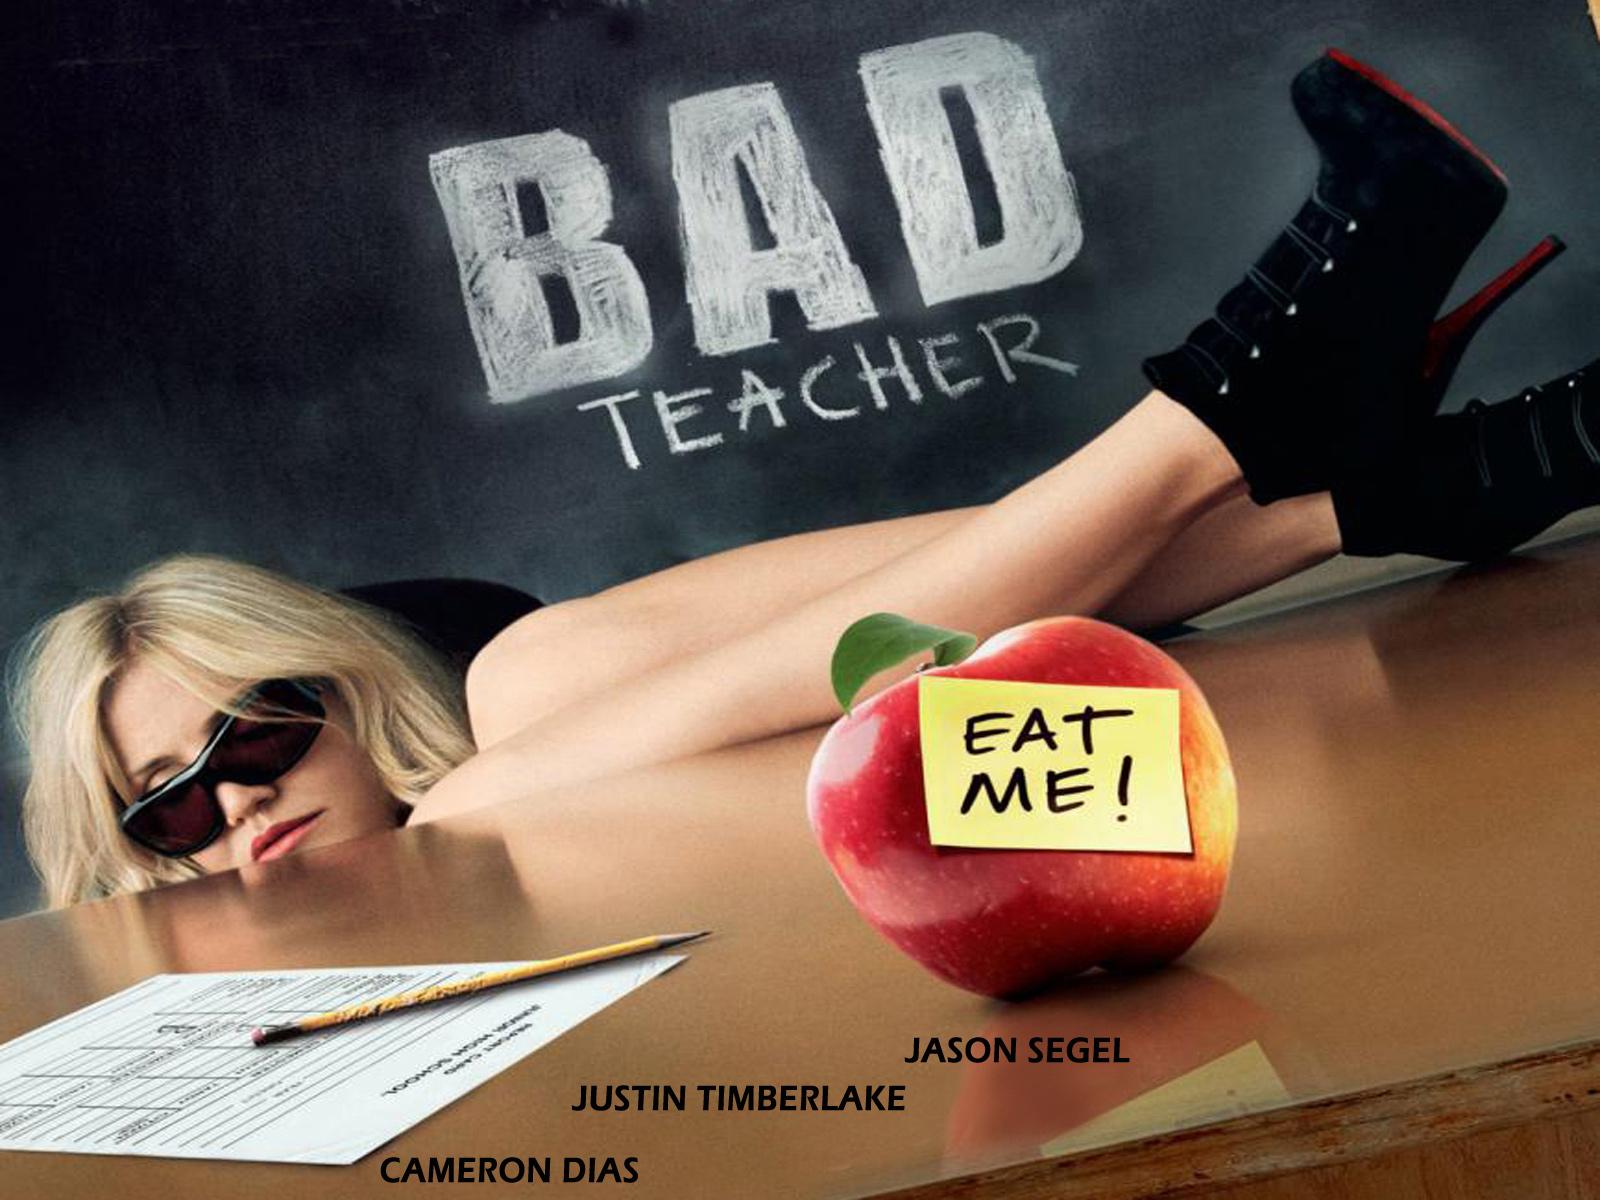 Bad Teacher movie